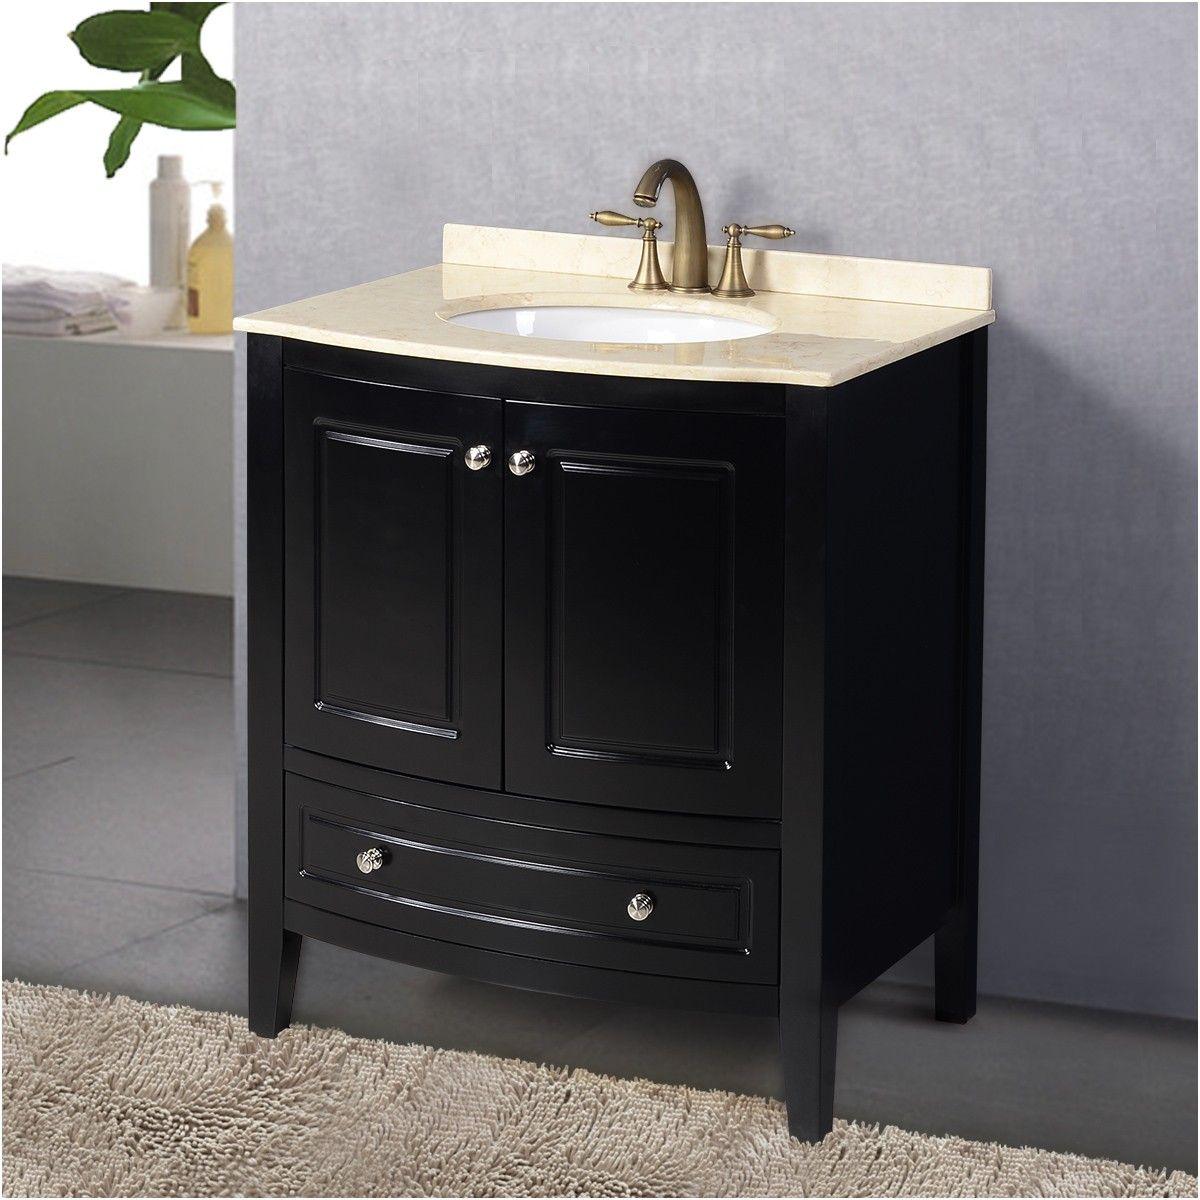 Corner Bathroom Sink Base Cabinet Bathroom Sinks Decoration From Sink Base Cabinet Bathroom Cheap Bathroom Vanities Cheap Bathrooms Bathroom Vanity